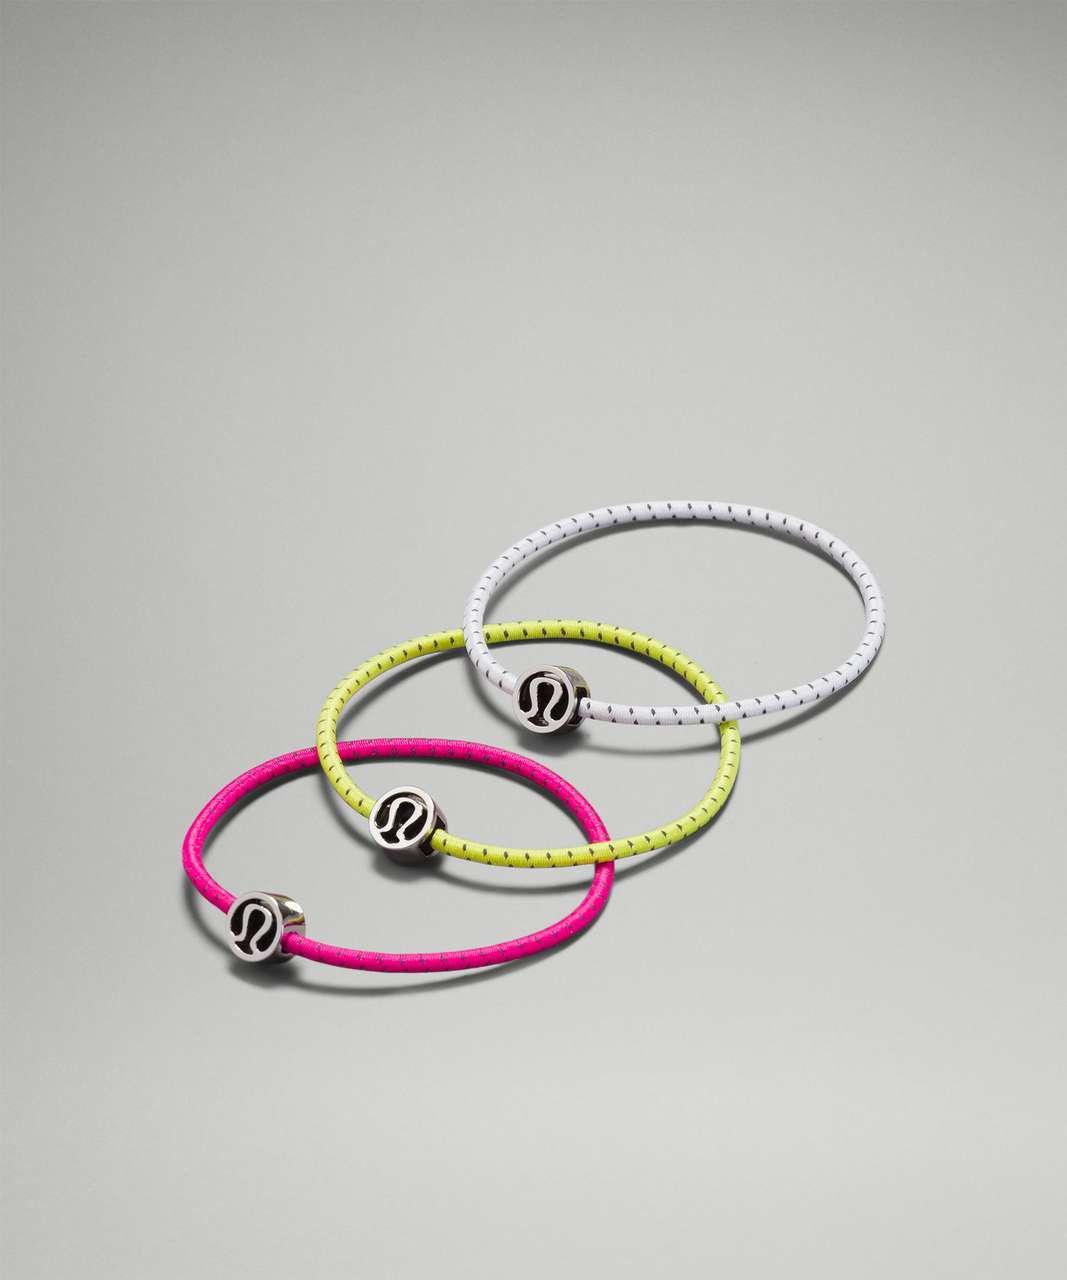 Lululemon Glow On Hair Ties - Pow Pink / Yellow Serpentine / White